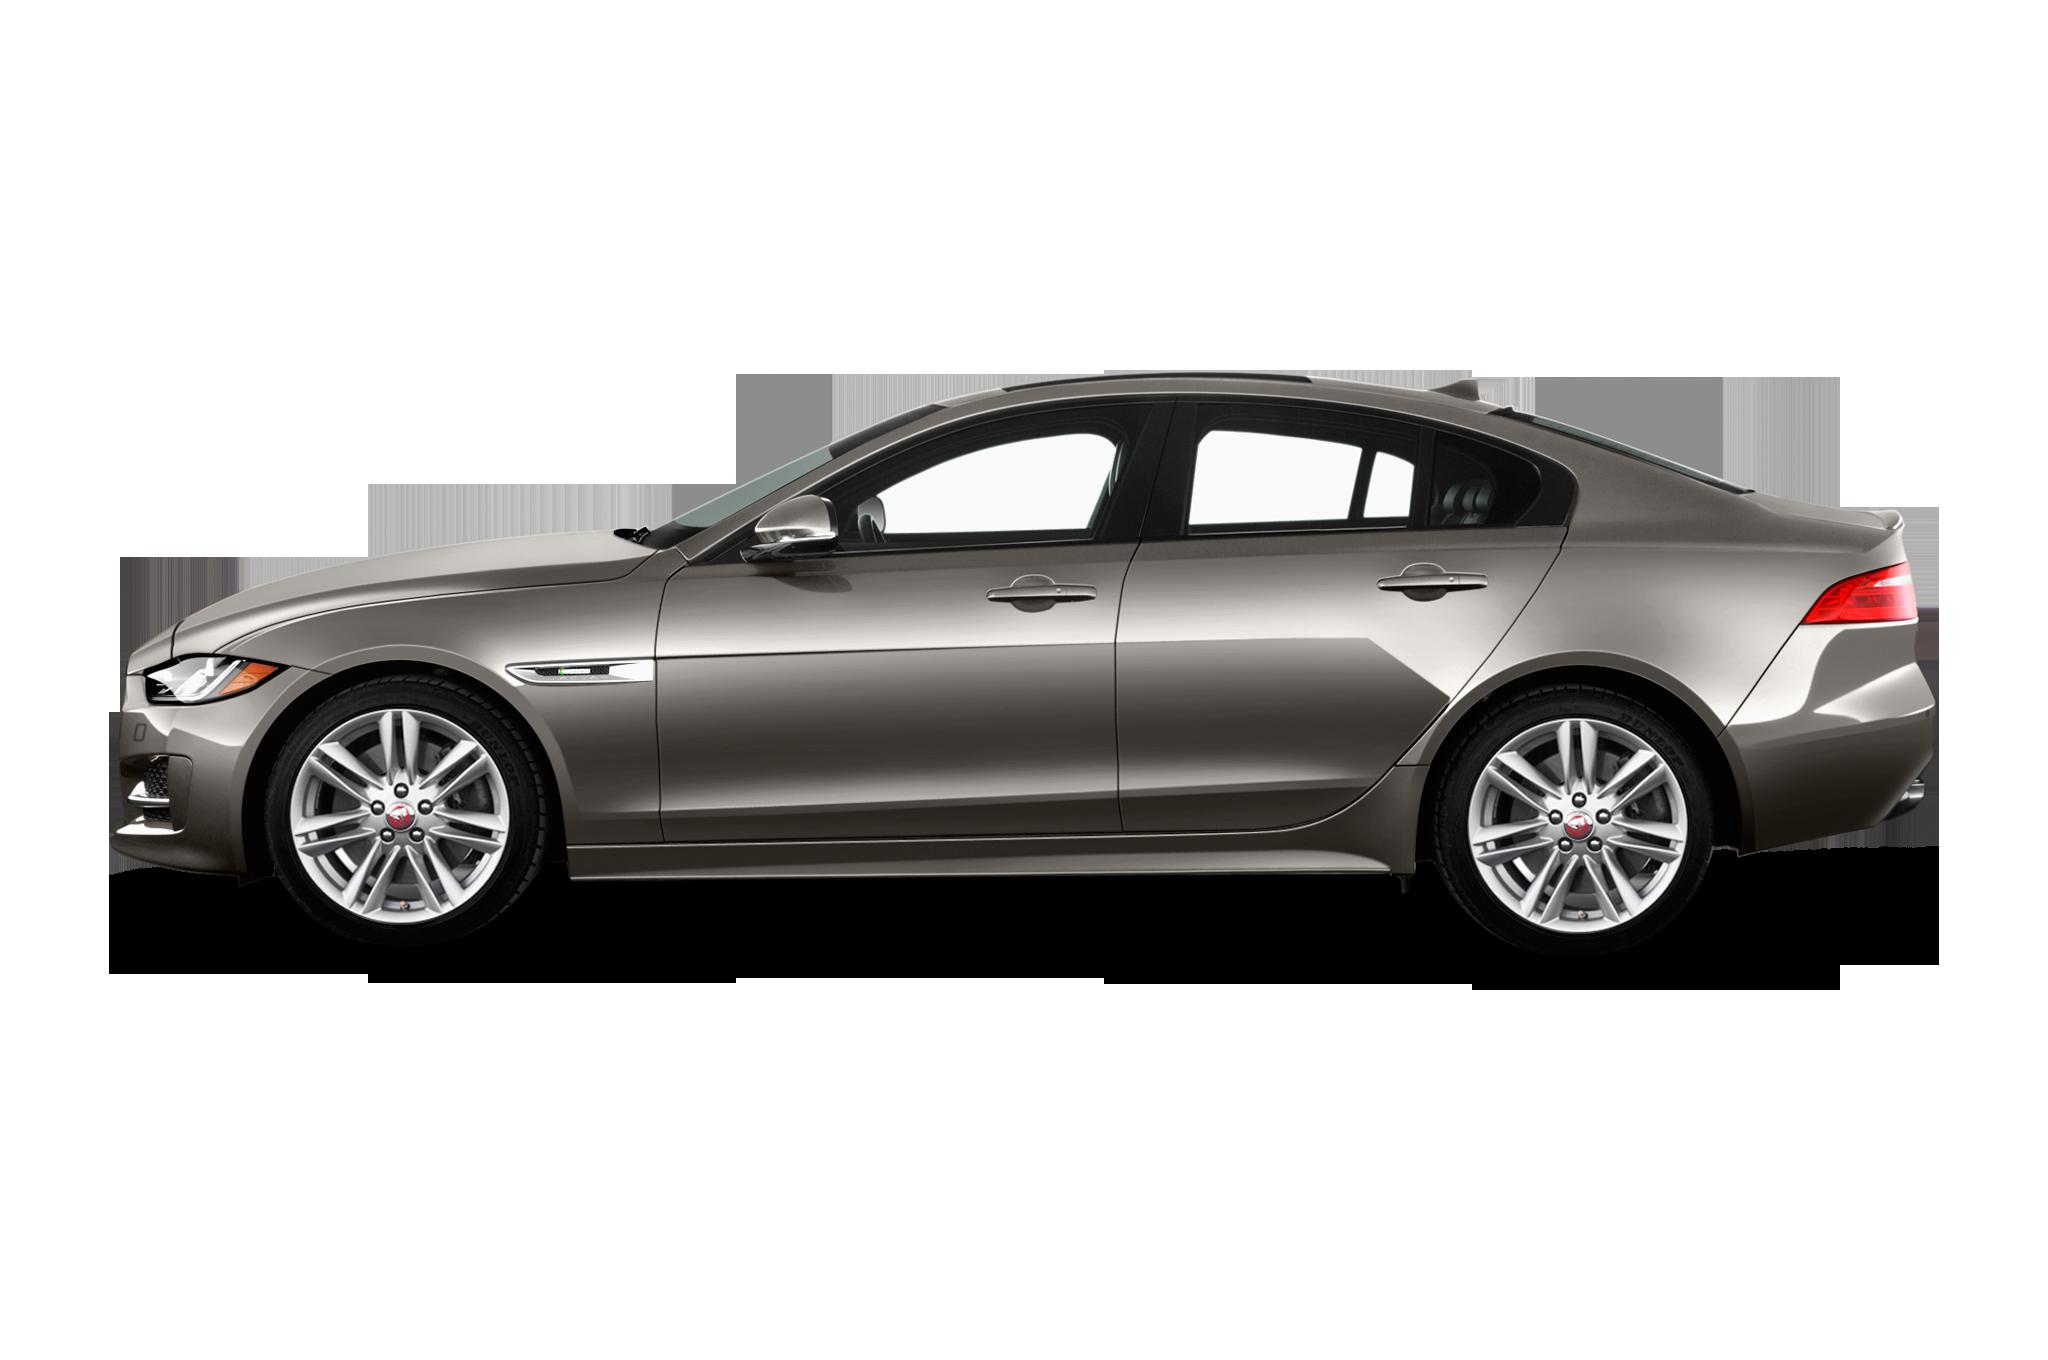 Jaguar car clipart graphic free  graphic free